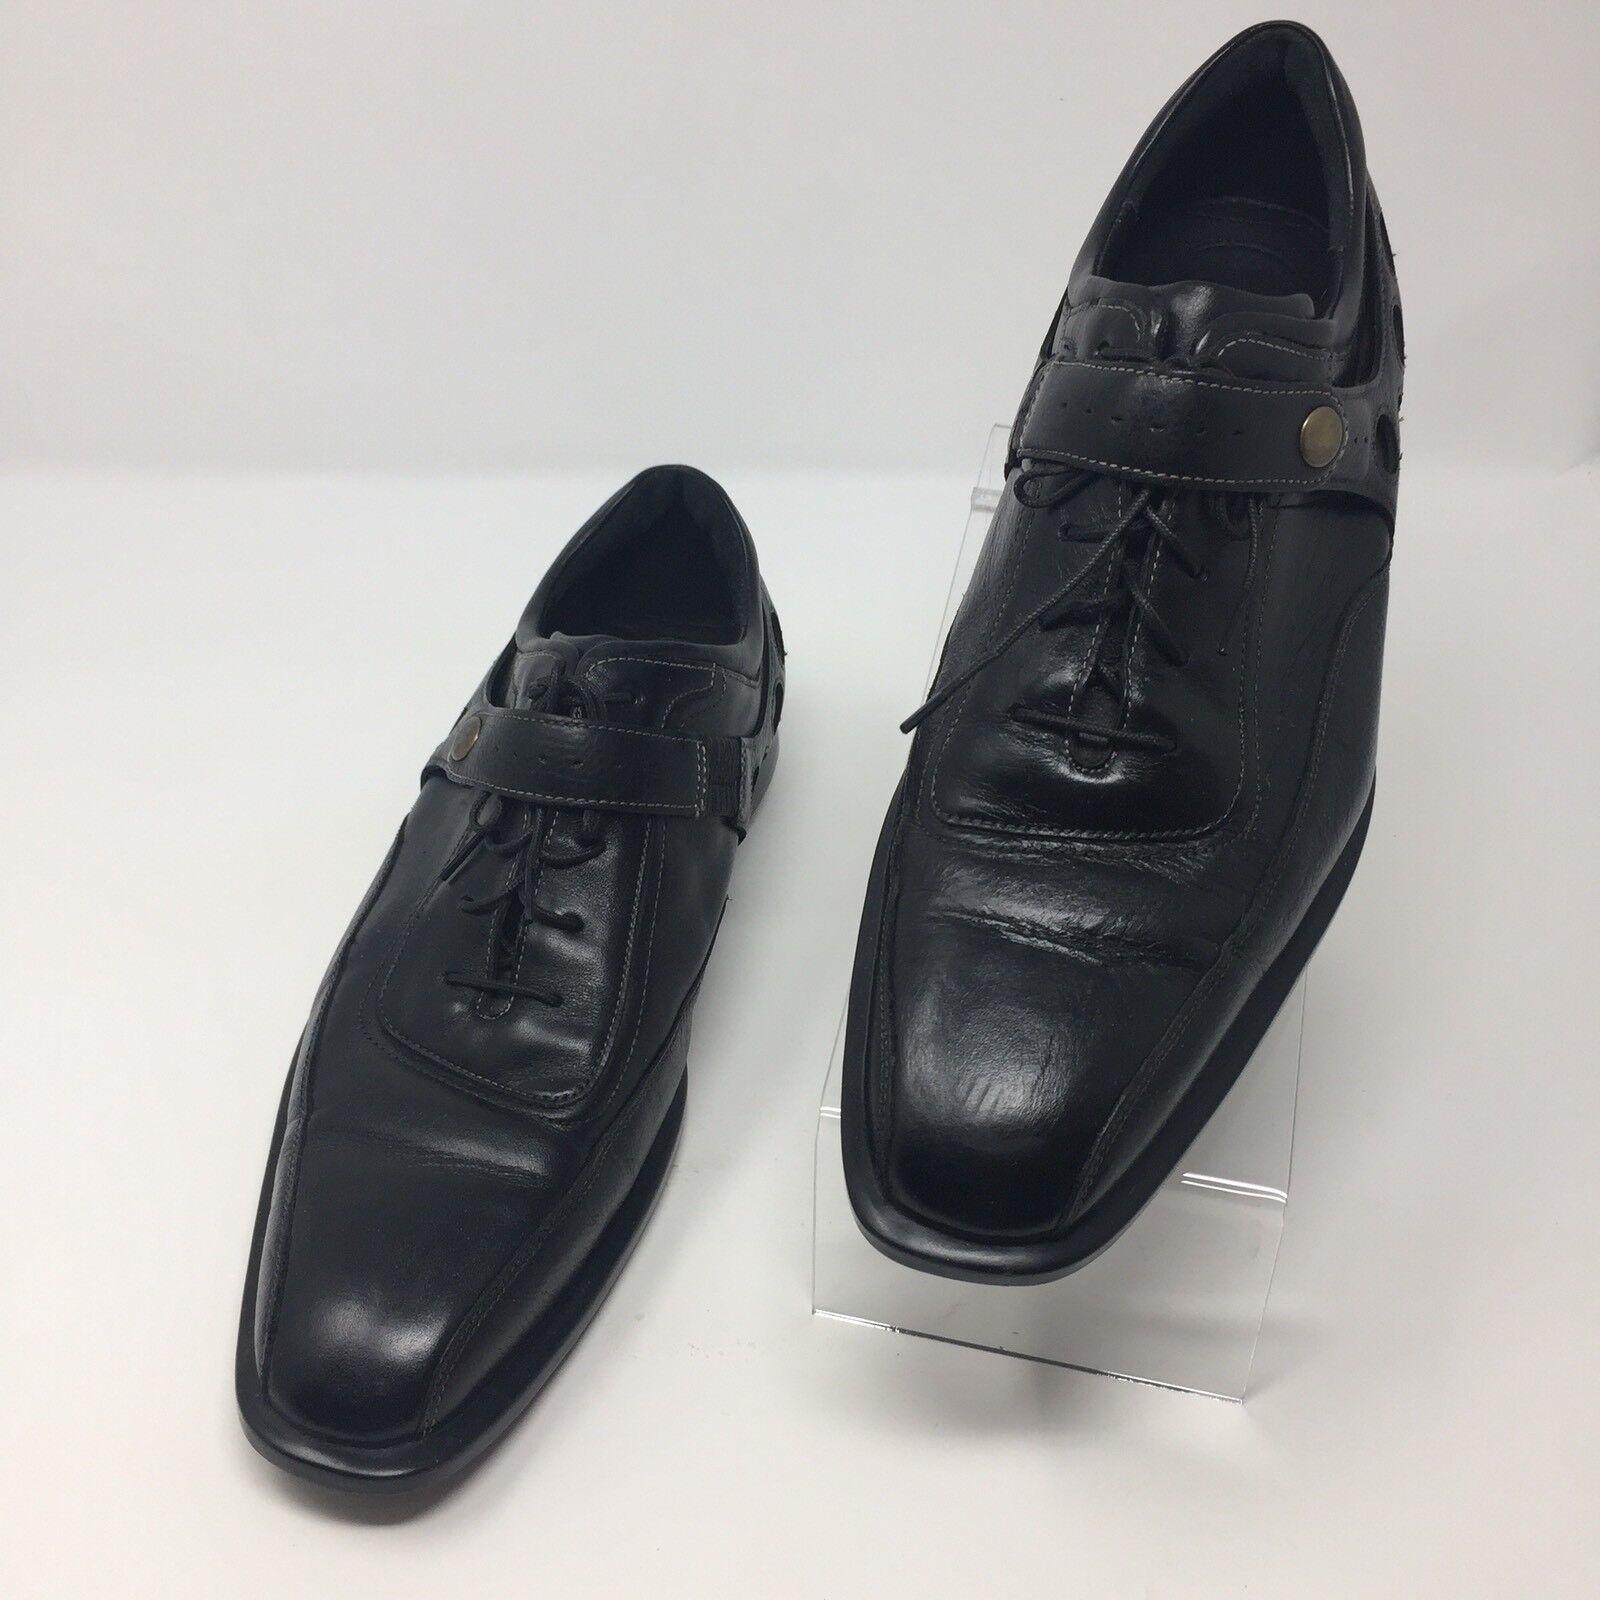 Cole Haan Mens Casual Dress shoes Cushion Sz 8M Black Leather Tie & Snap